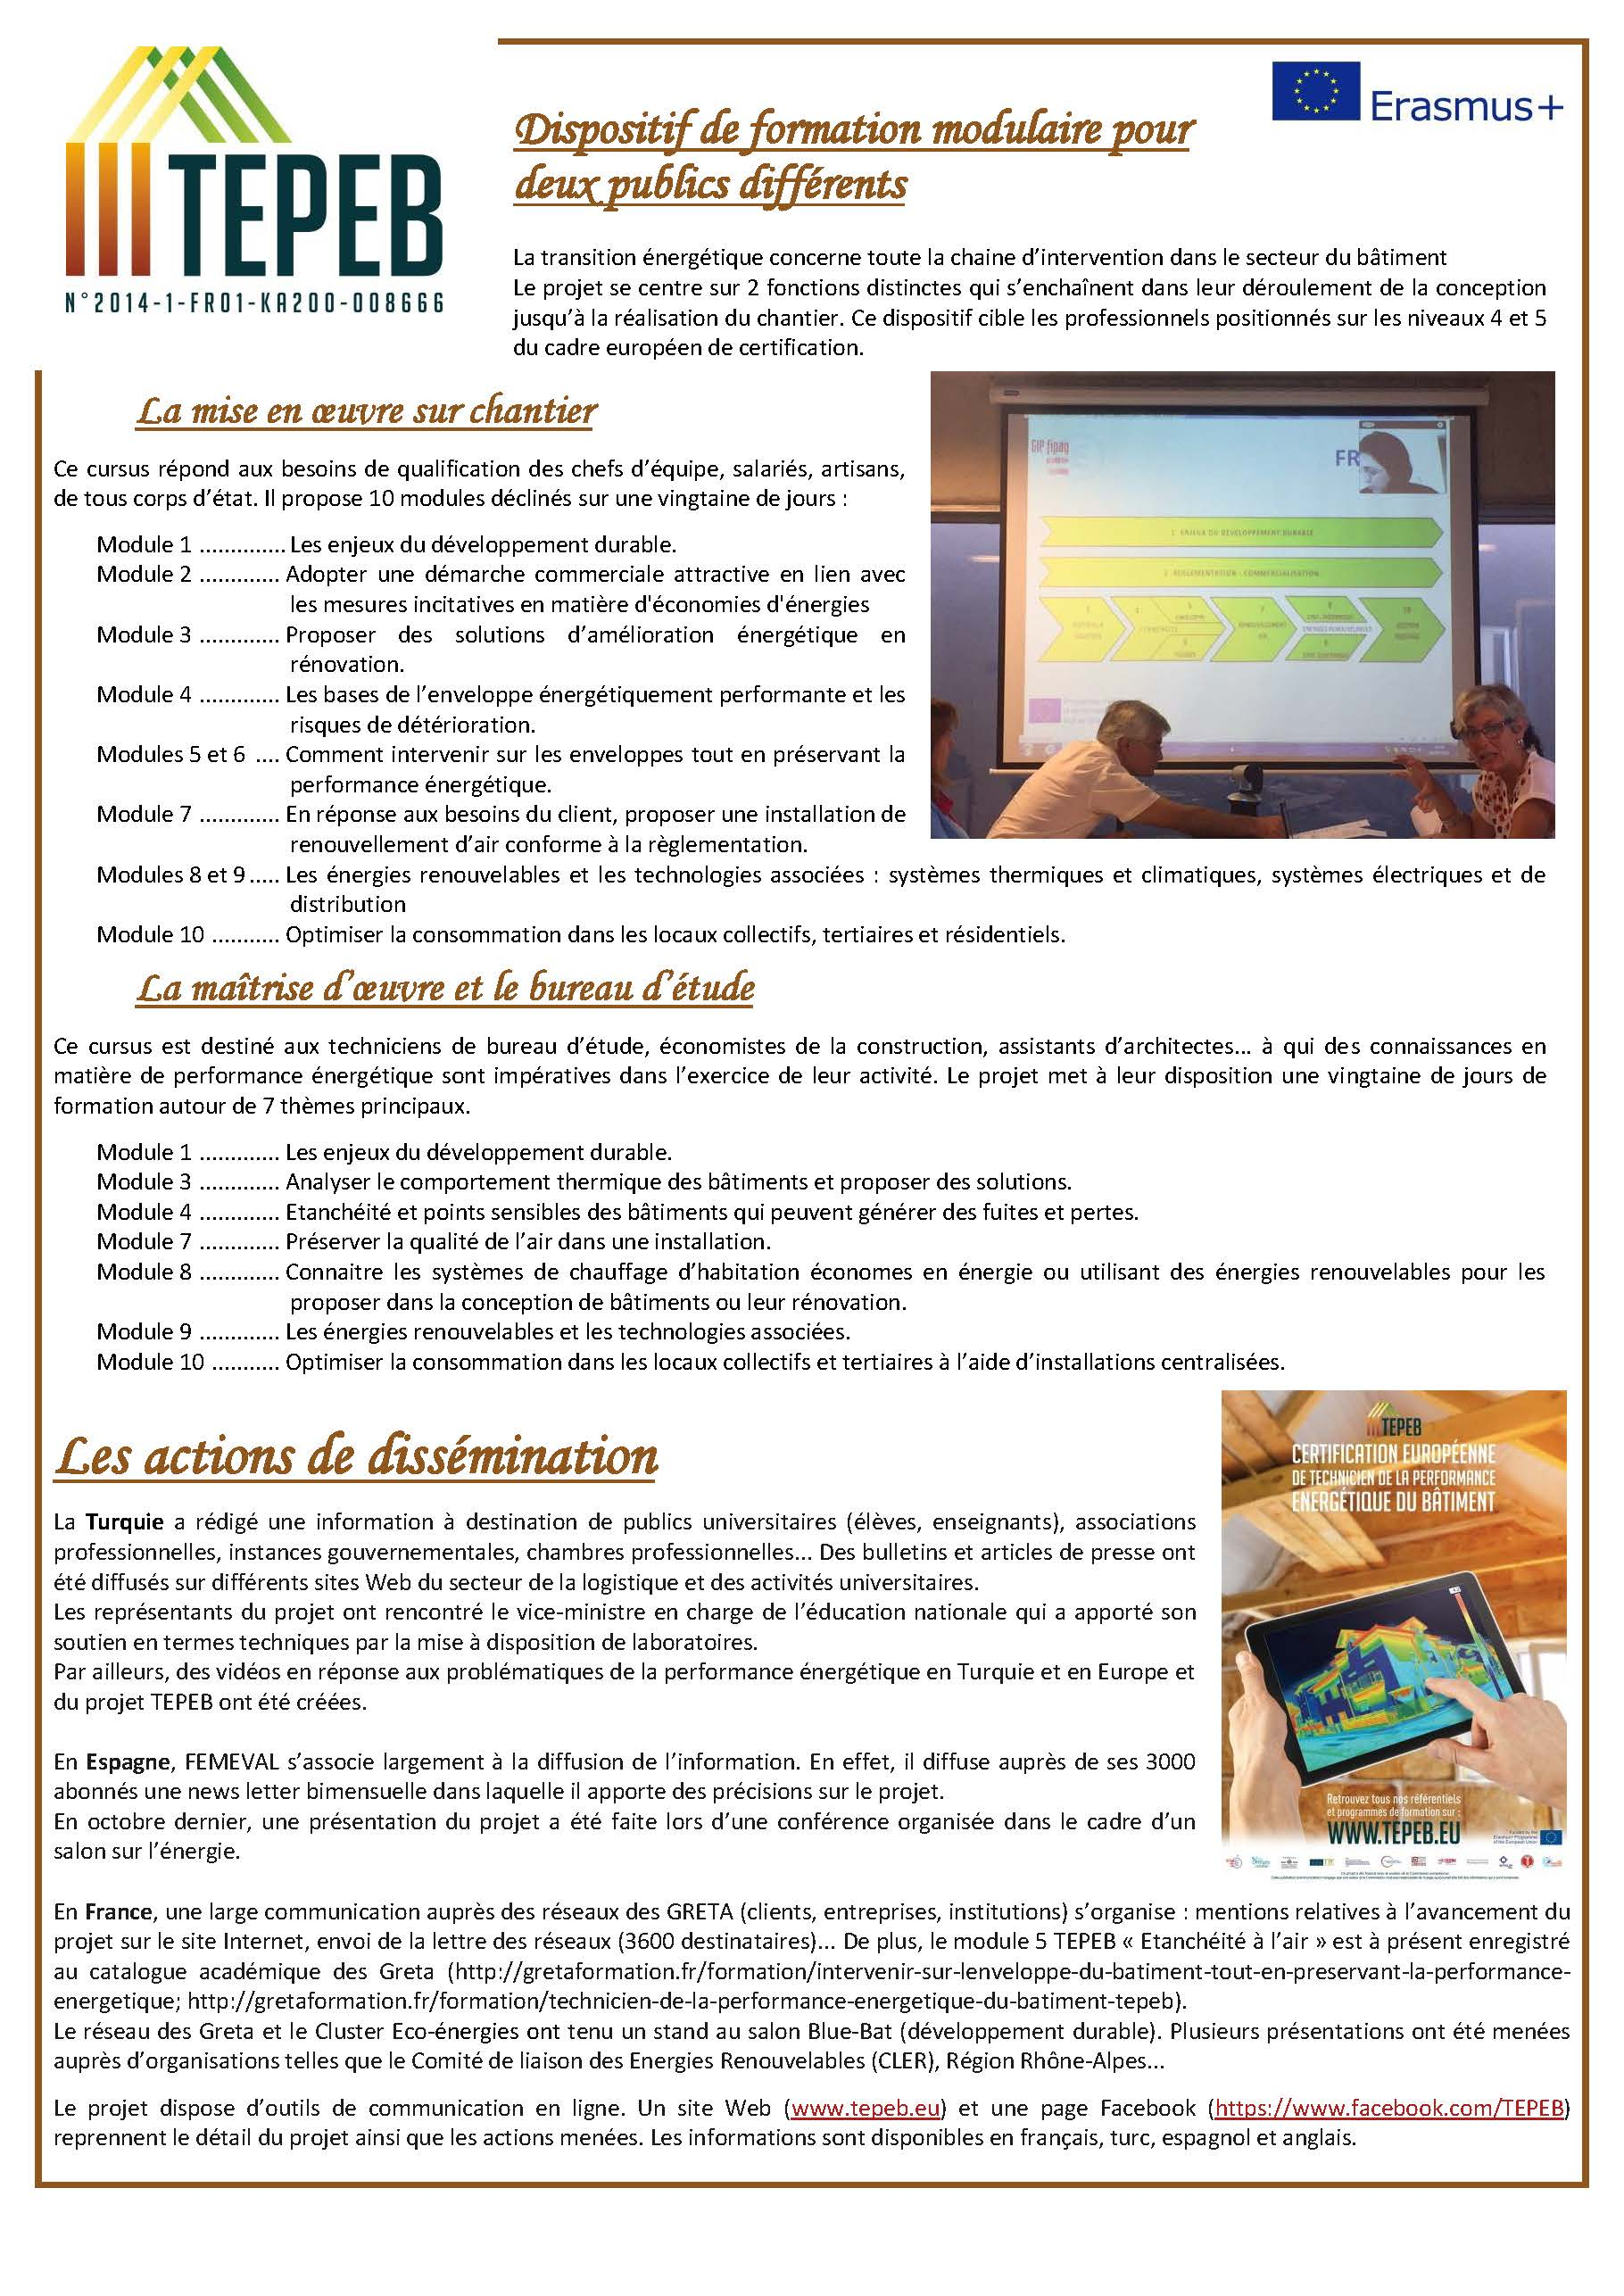 Premier Newsletter Du Projet Tepeb